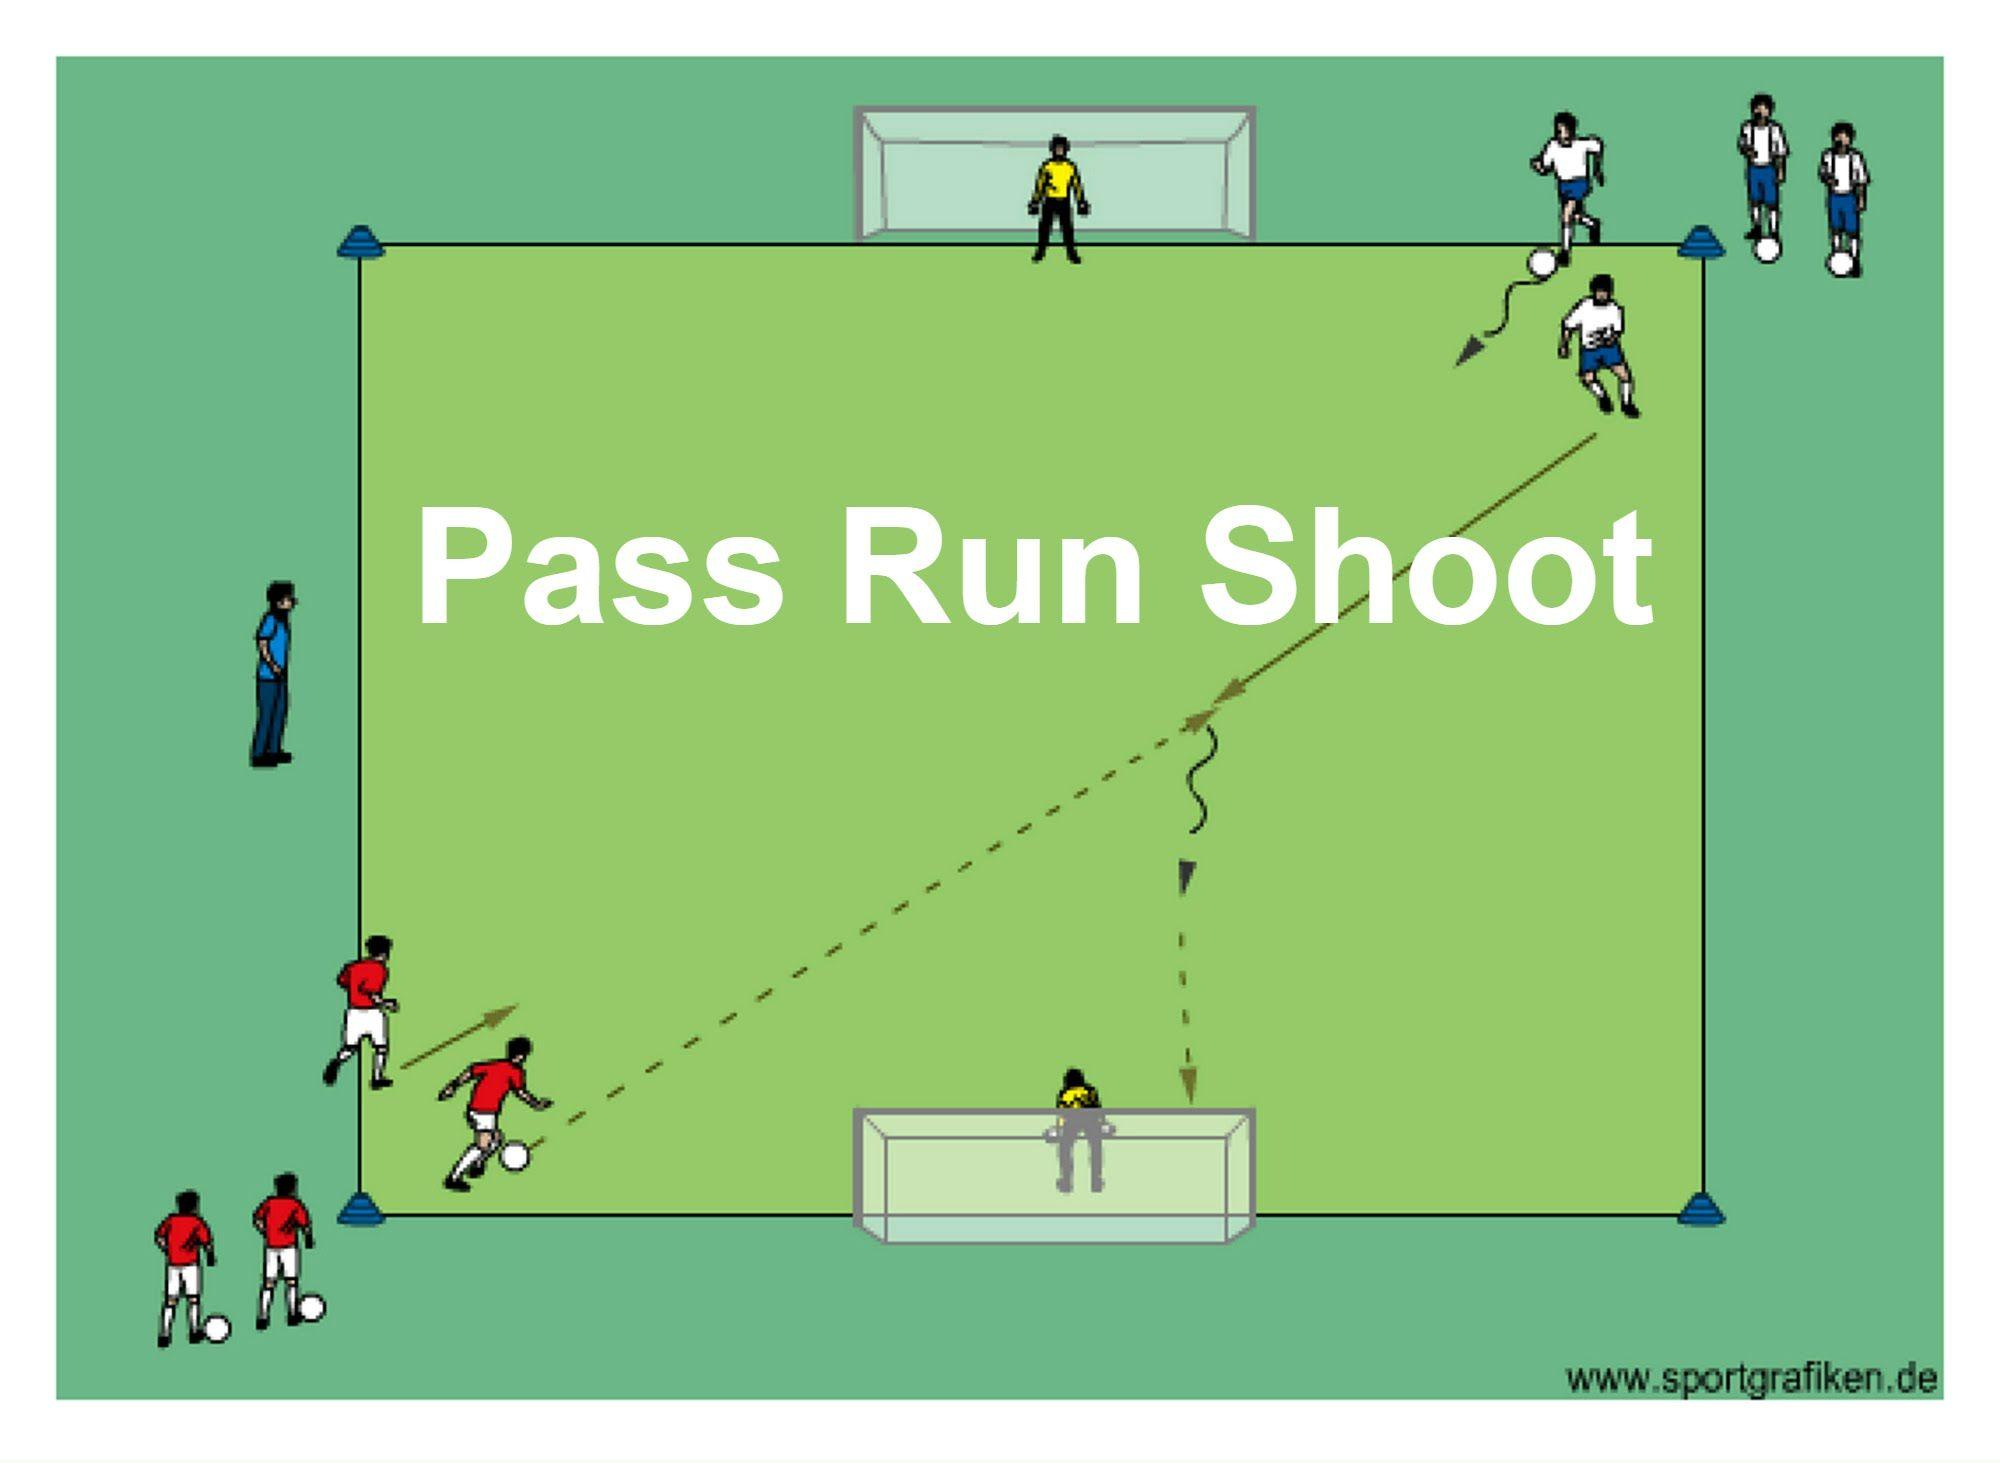 Fun Shooting Drill Shooting Tips: Soccer Training Drills, Soccer